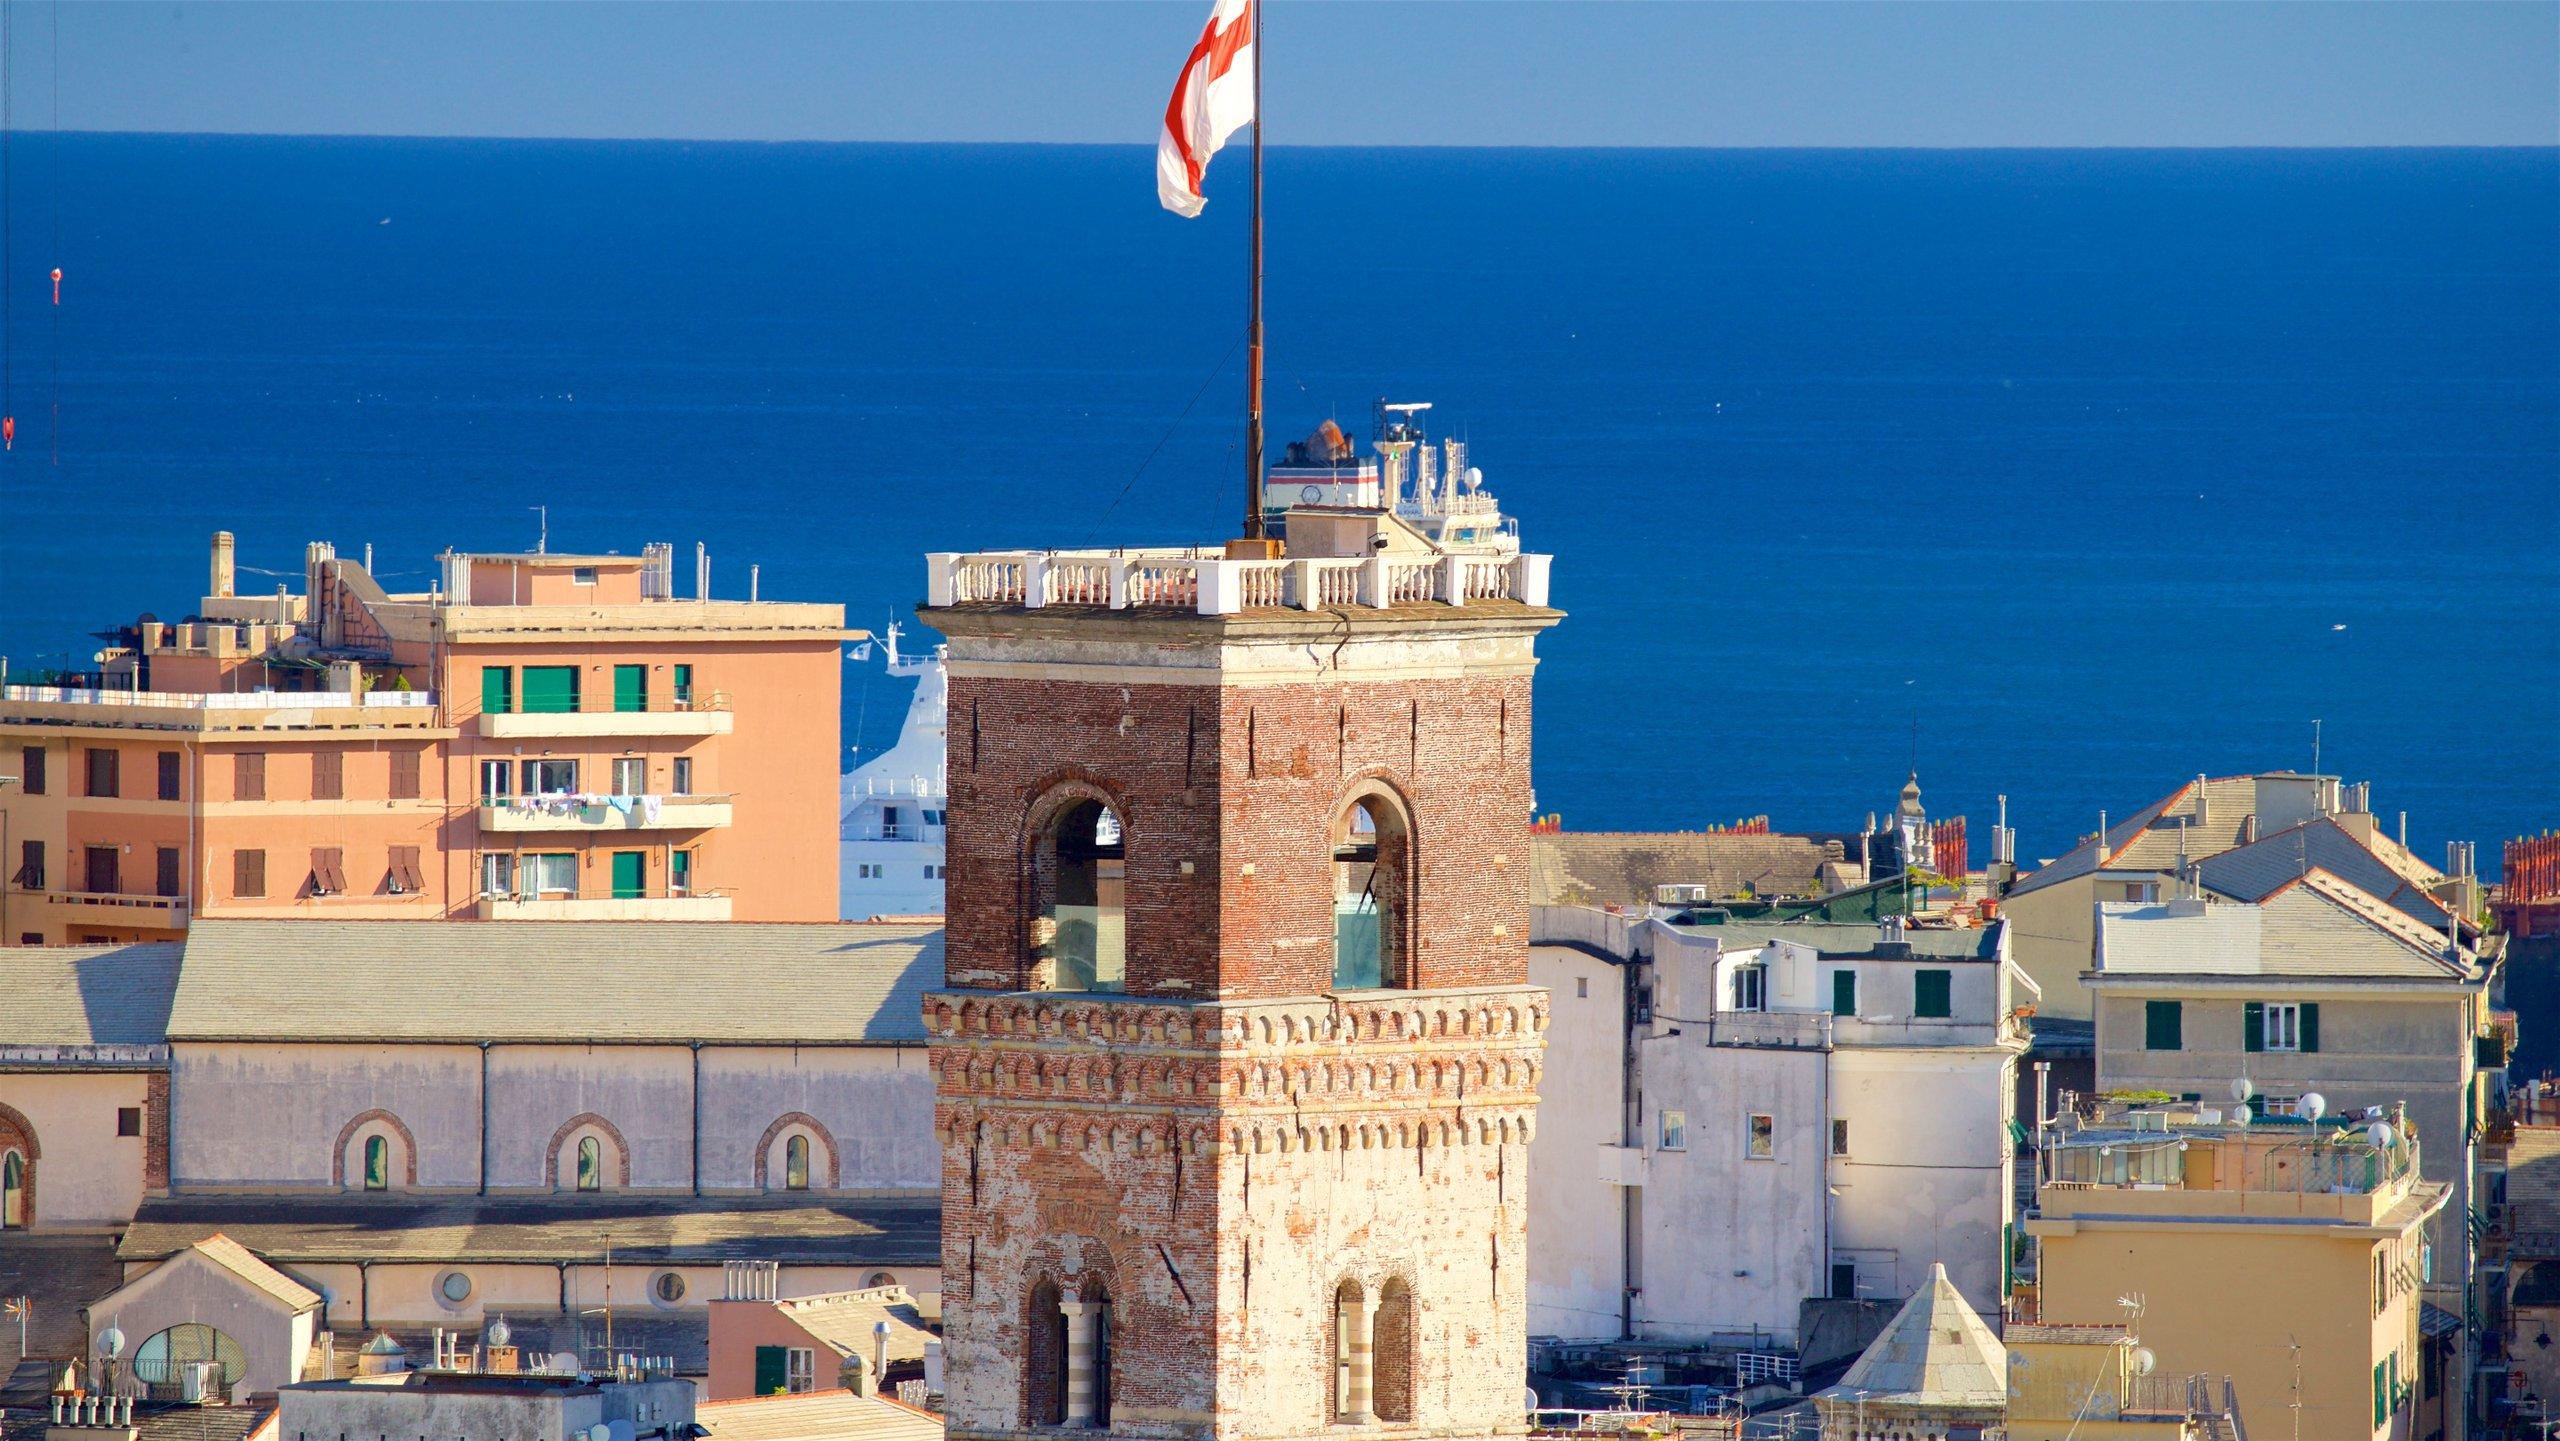 Castelletto, Genoa, Liguria, Italy